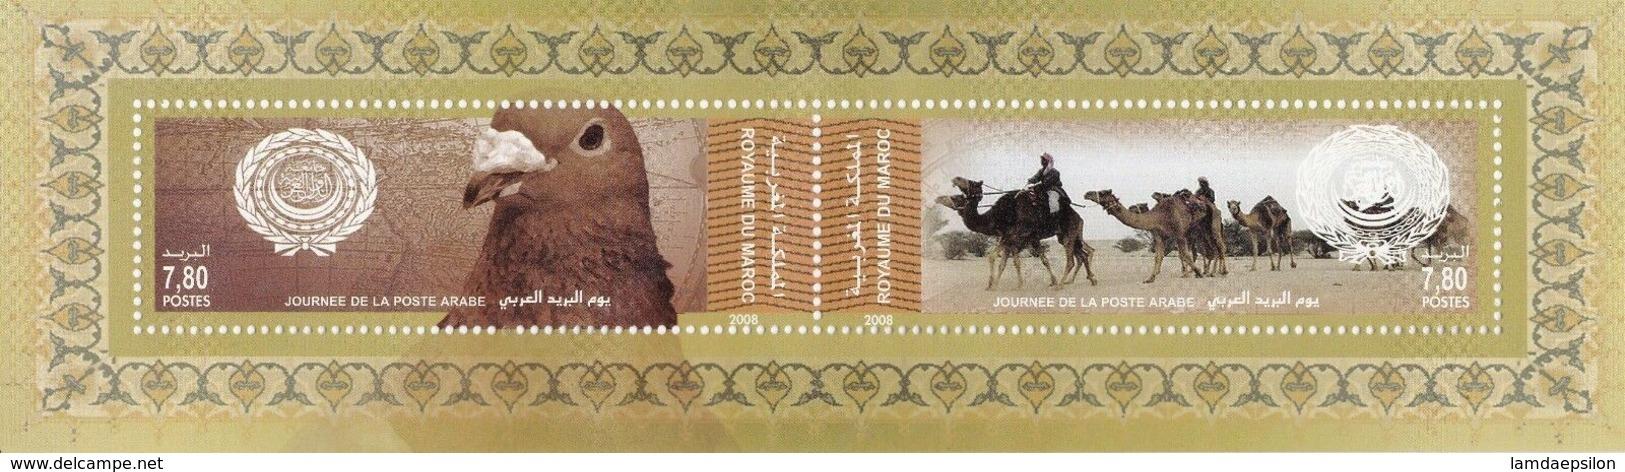 MOROCCO JOURNEE DU TIMBRE ARABE , FAUCON DROMADAIRES 2008 - Morocco (1956-...)